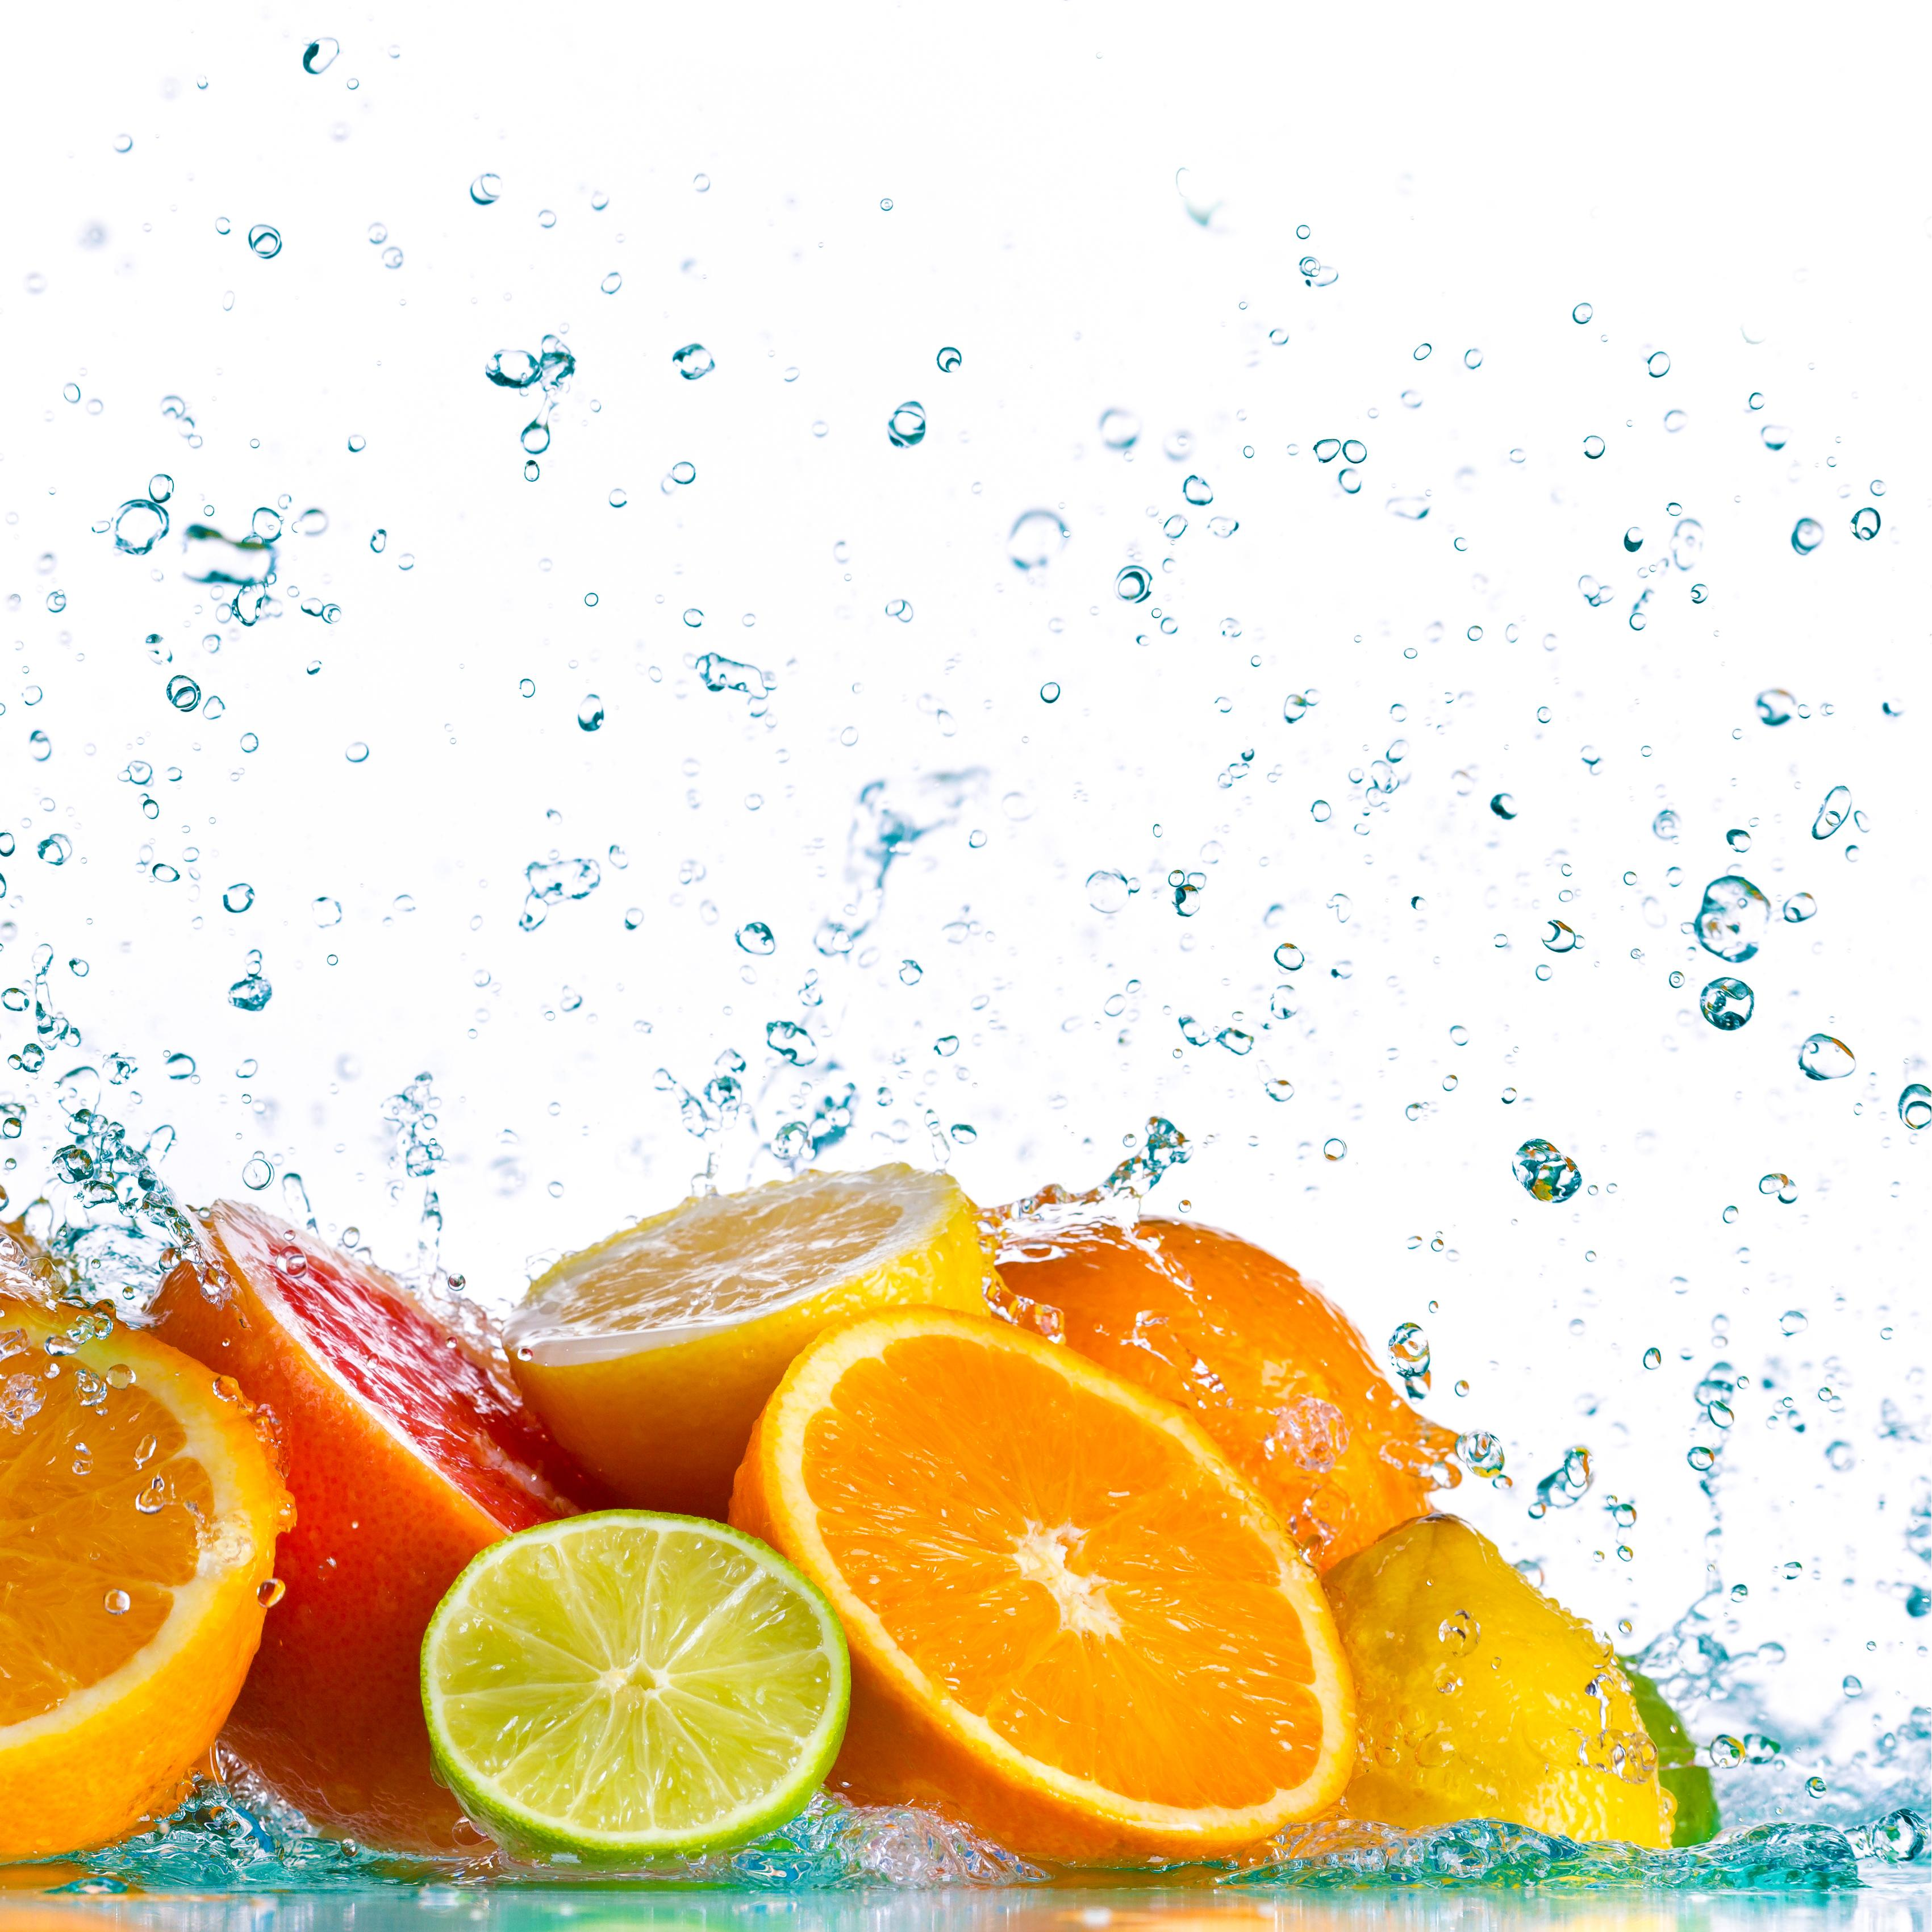 citric acid content in orange juice experiment On a molecular level, orange juice is composed of organic acids, sugars, and phenolic compounds the main organic acids found in orange juice are citric, malic, and ascorbic acid the major sugars found in orange.